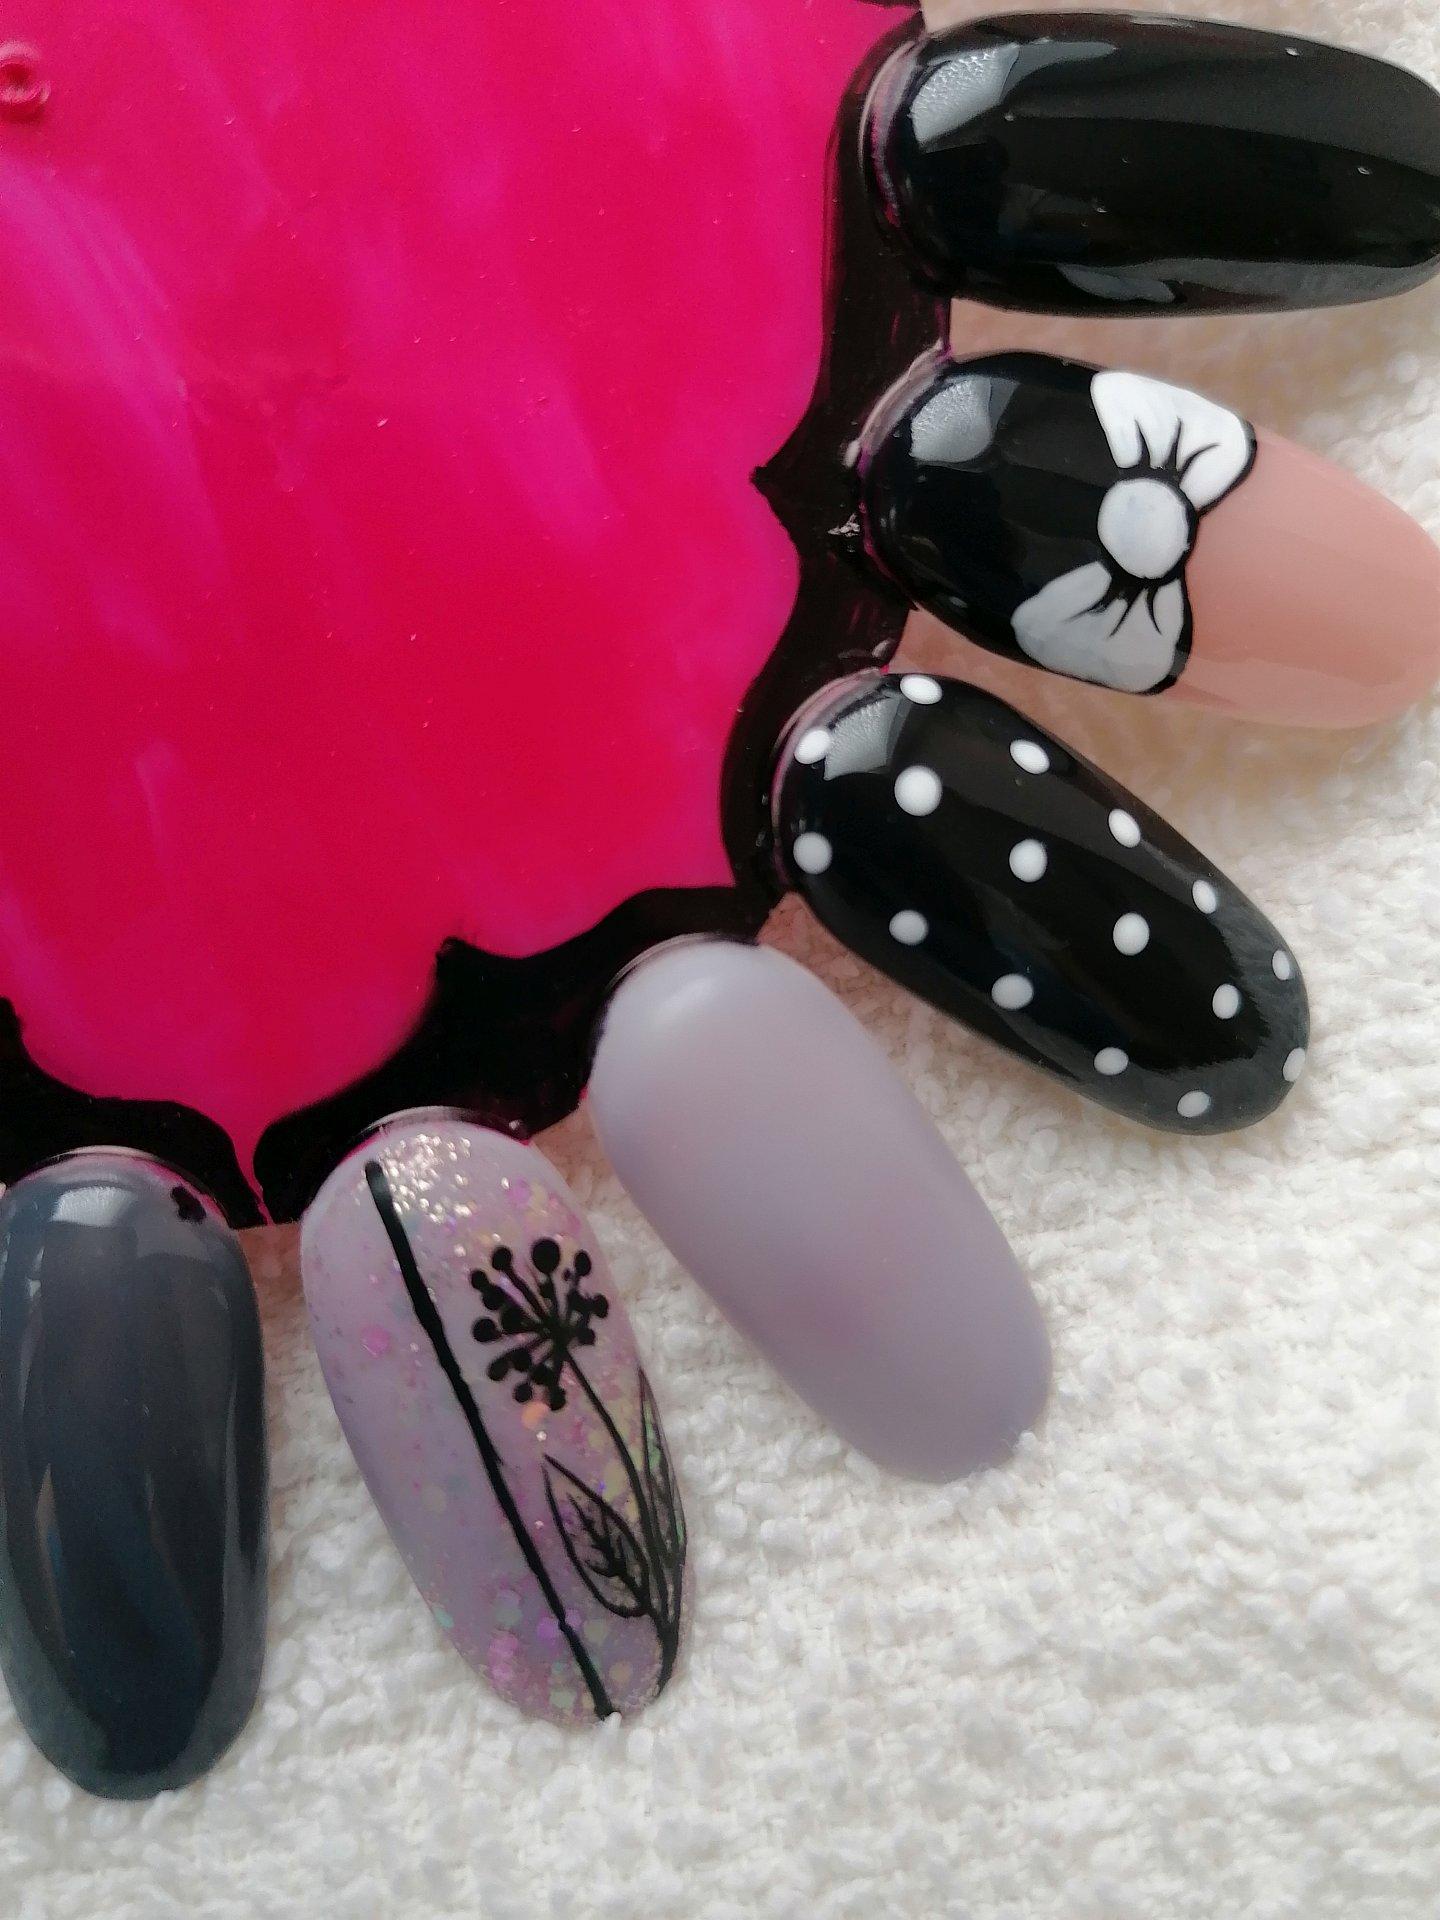 Kosmetika Manikura Pedikura Salon Papilio Nova Paka